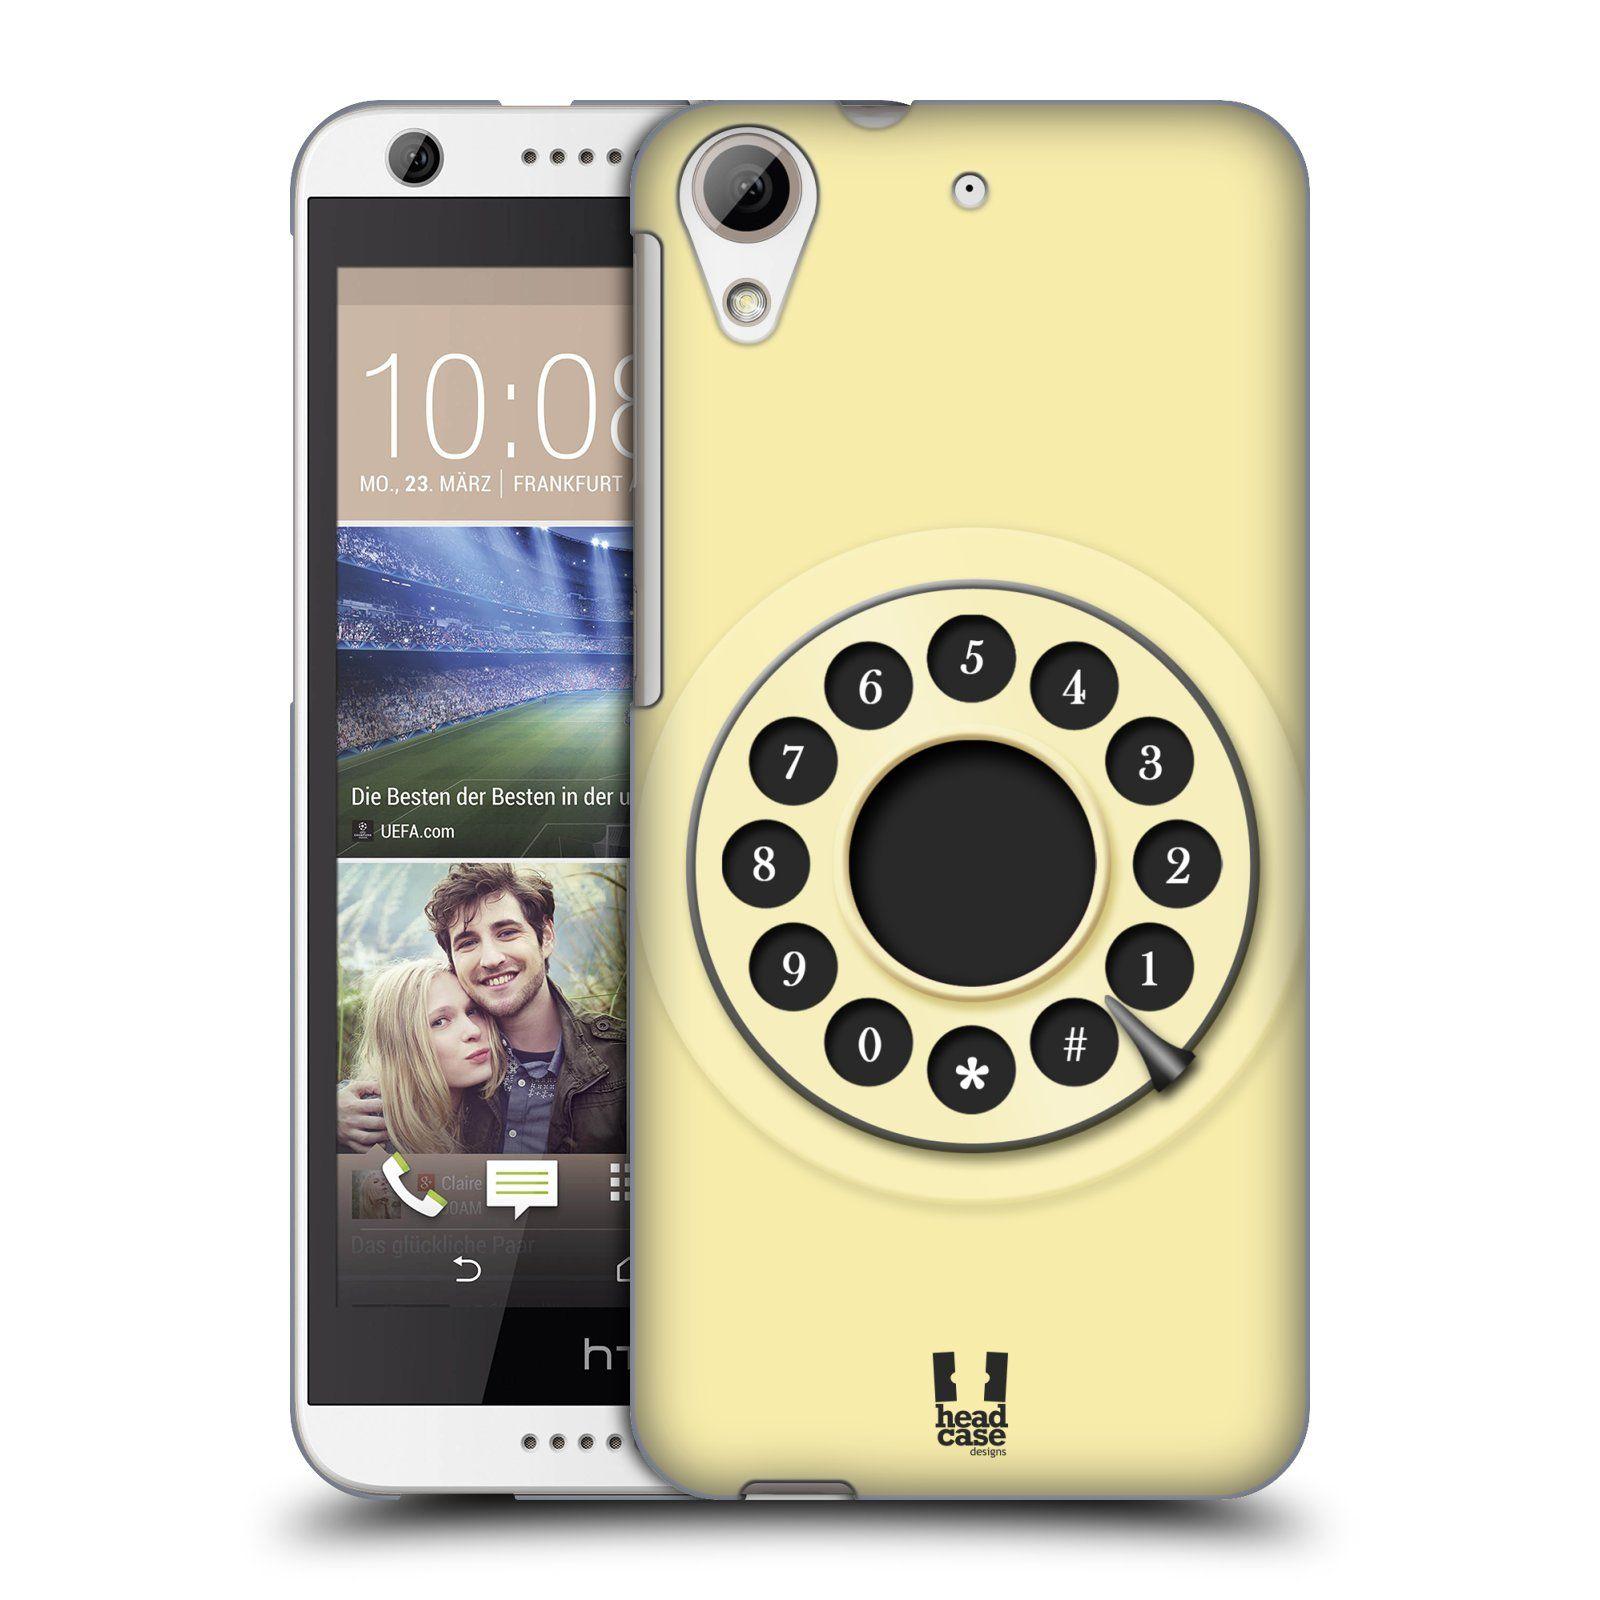 100% authentic af58b 21d09 Head Case Designs Retro Phones Hard Back Case for HTC Desire 626 ...